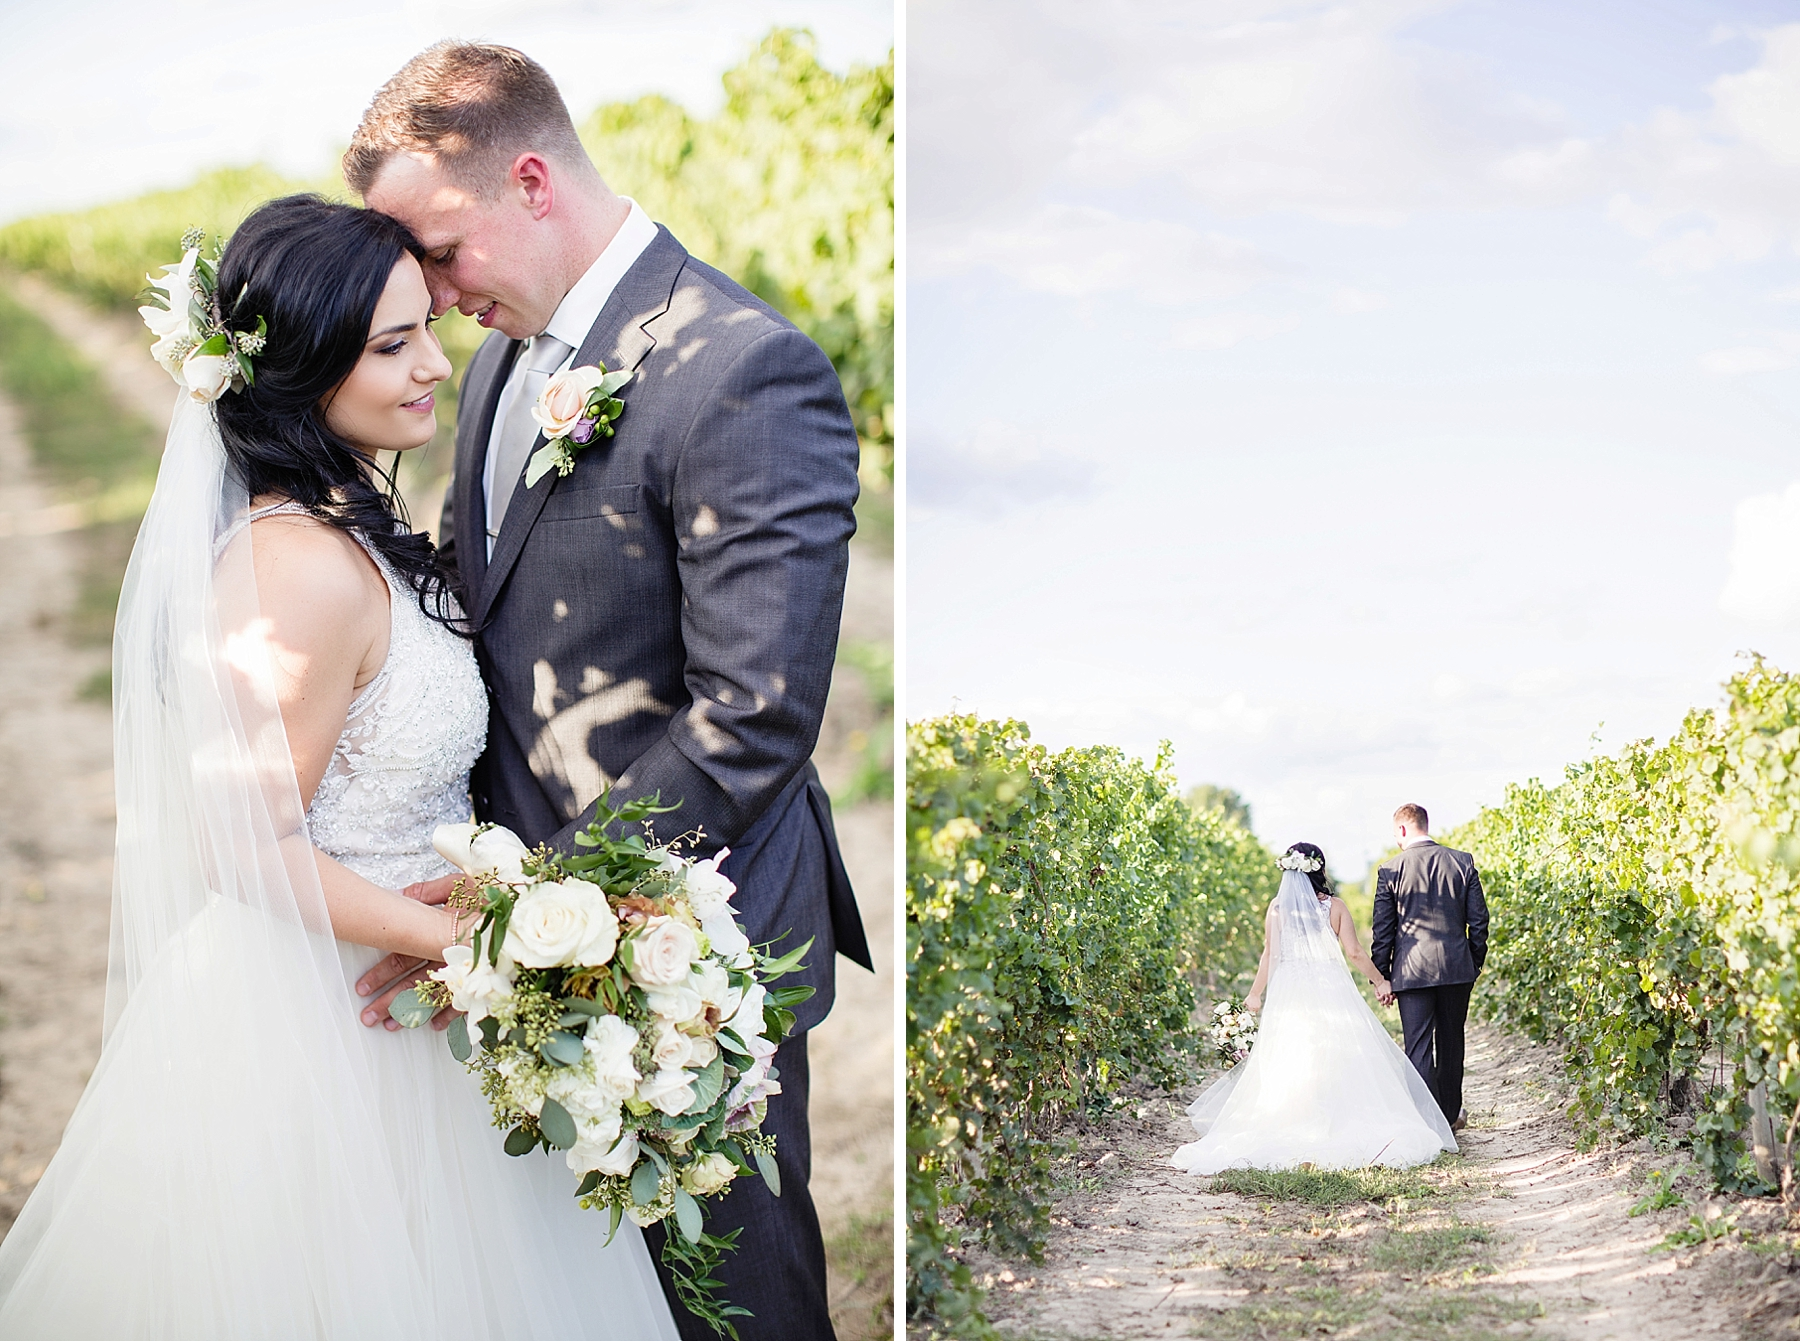 windsor-wedding-photographer-sprucewood-shores-winery-wedding-niagara-on-the-lake-wedding-photographer-eryn-shea-photography_0041.jpg